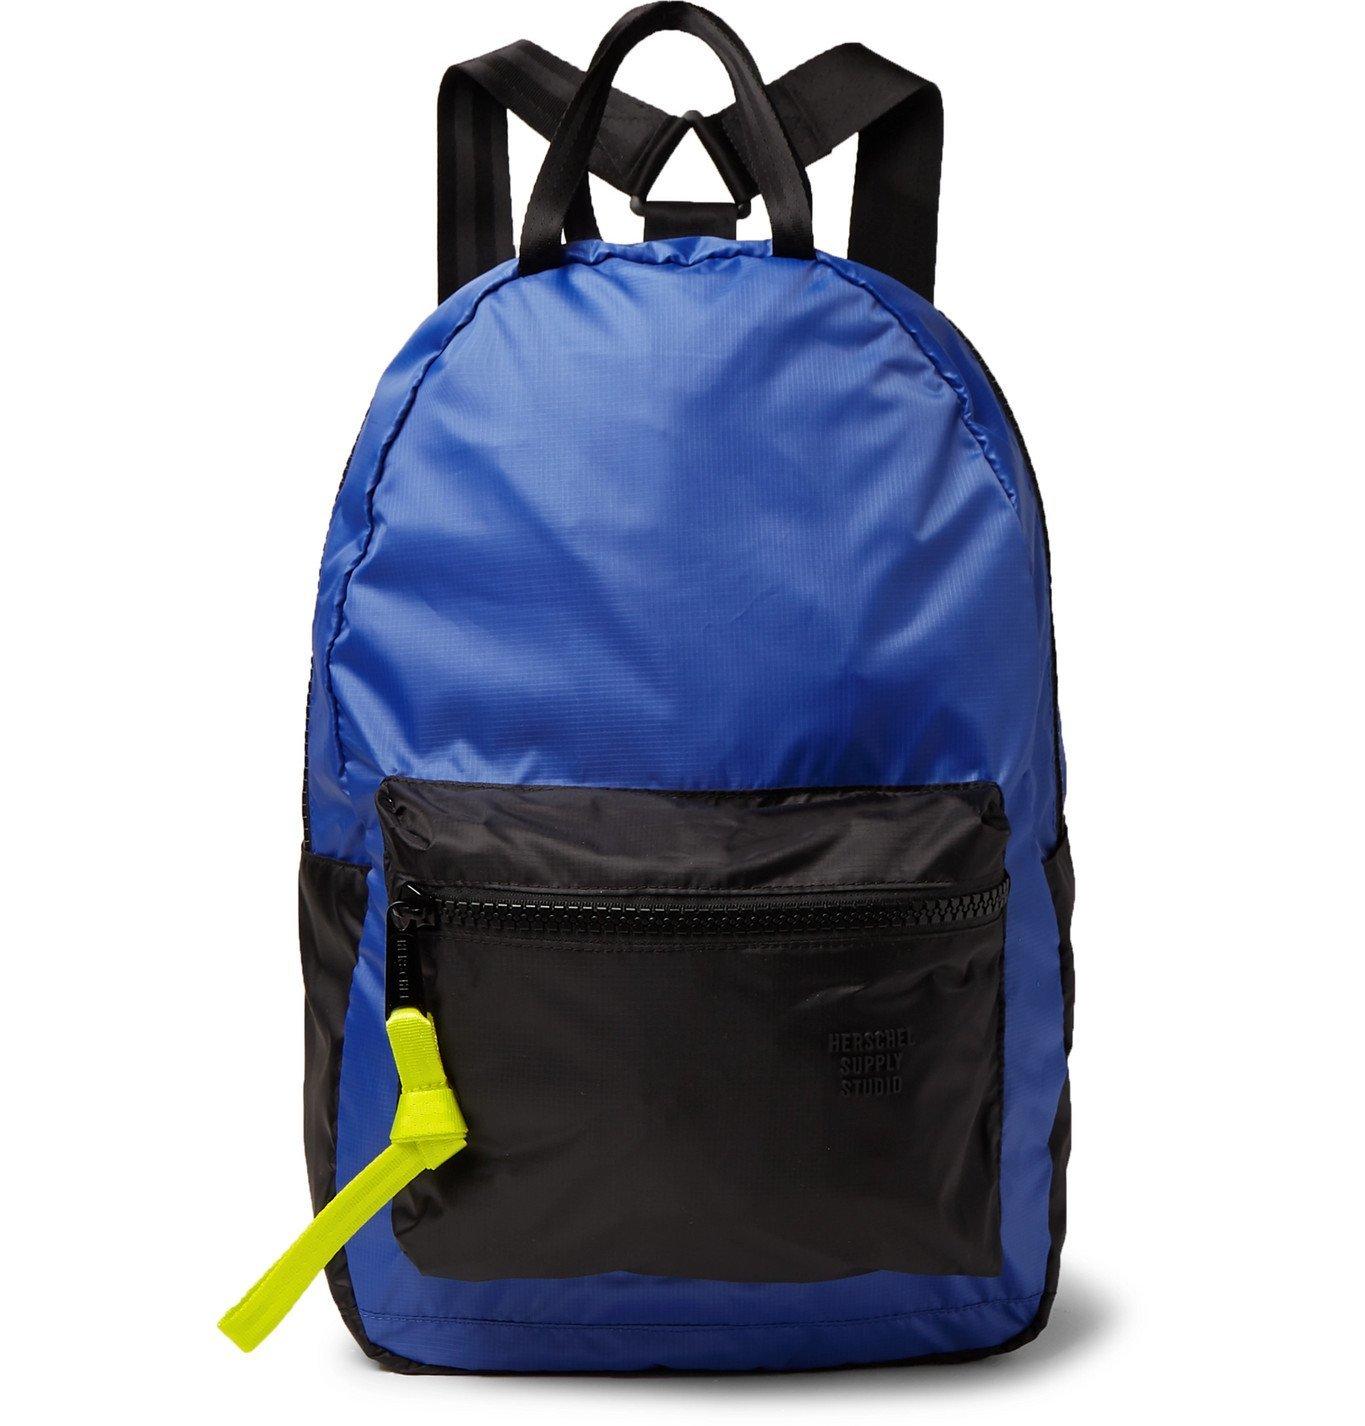 Photo: Herschel Supply Co - HS6 Ripstop Backpack - Blue